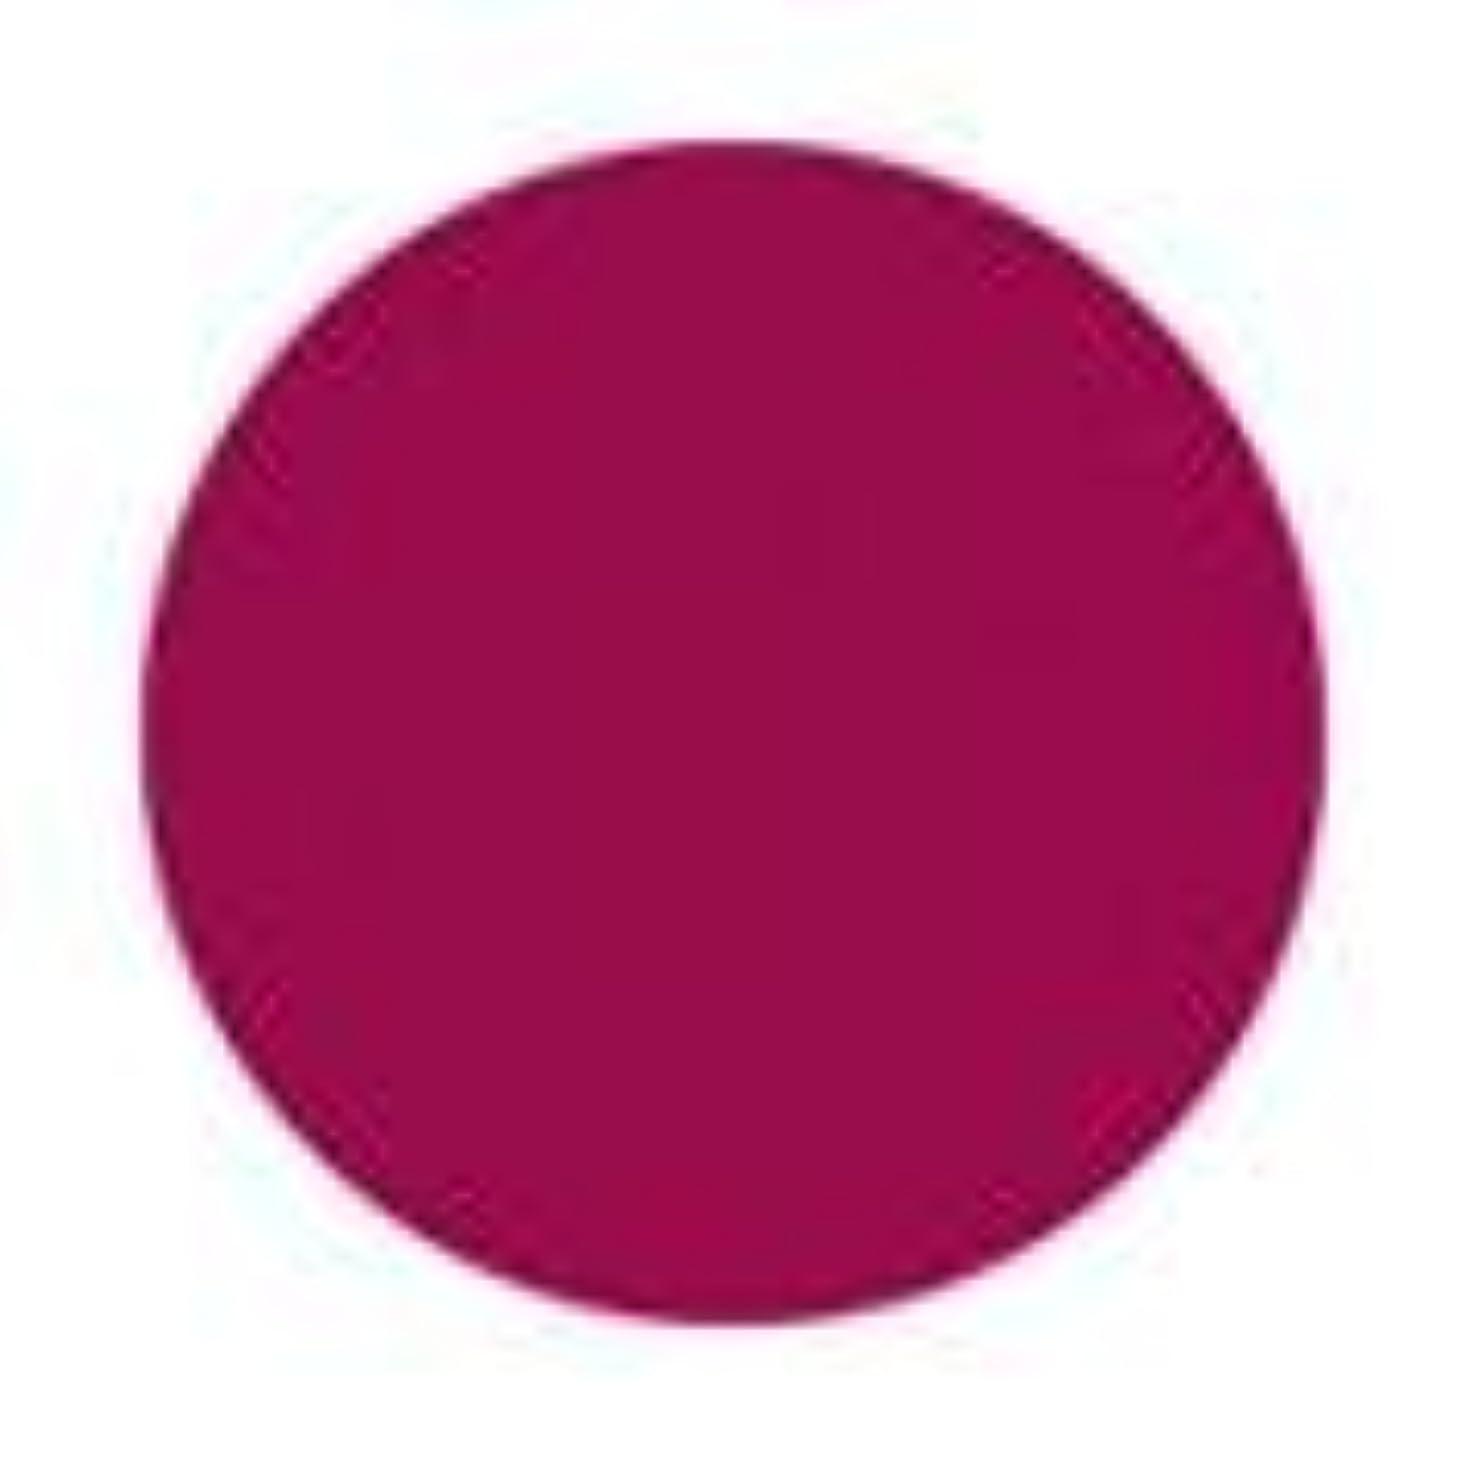 Jessica ジェレレーション カラー 15ml  485 ブライジングプリンセス